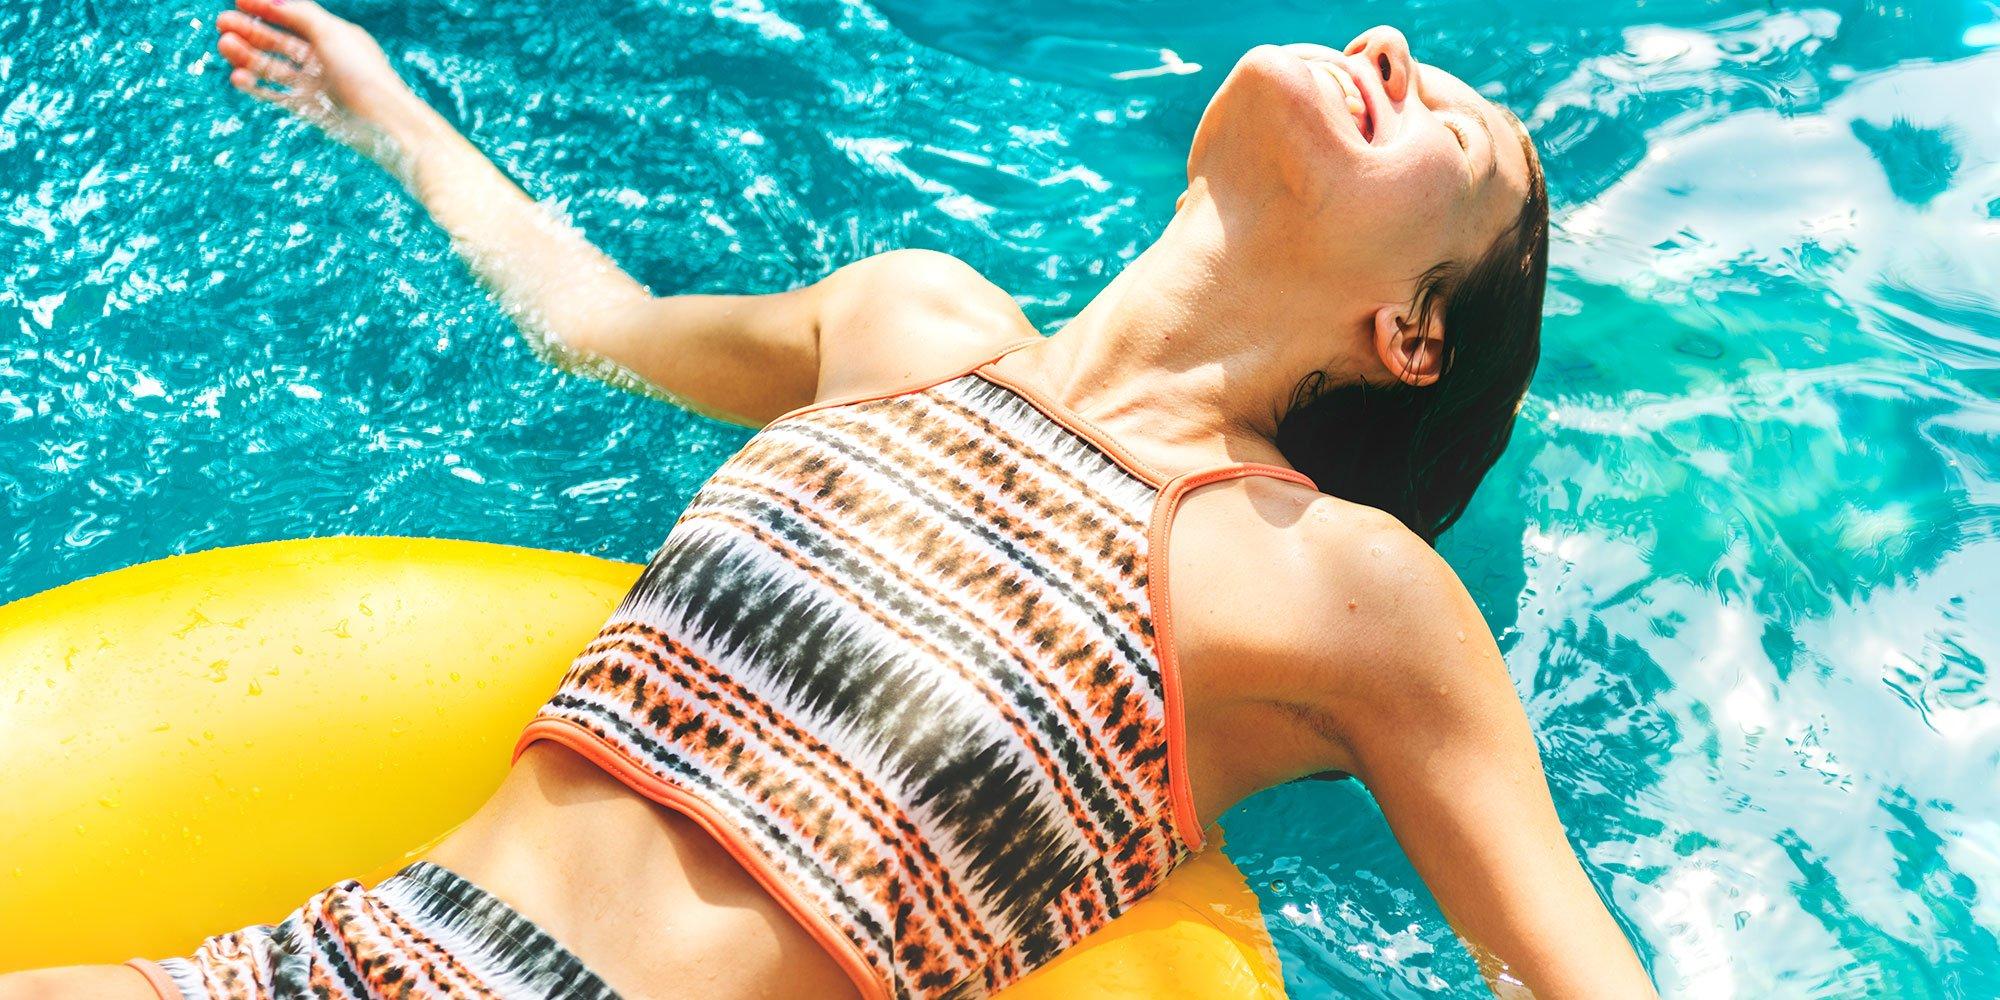 girl-in-pool-2000x.jpg